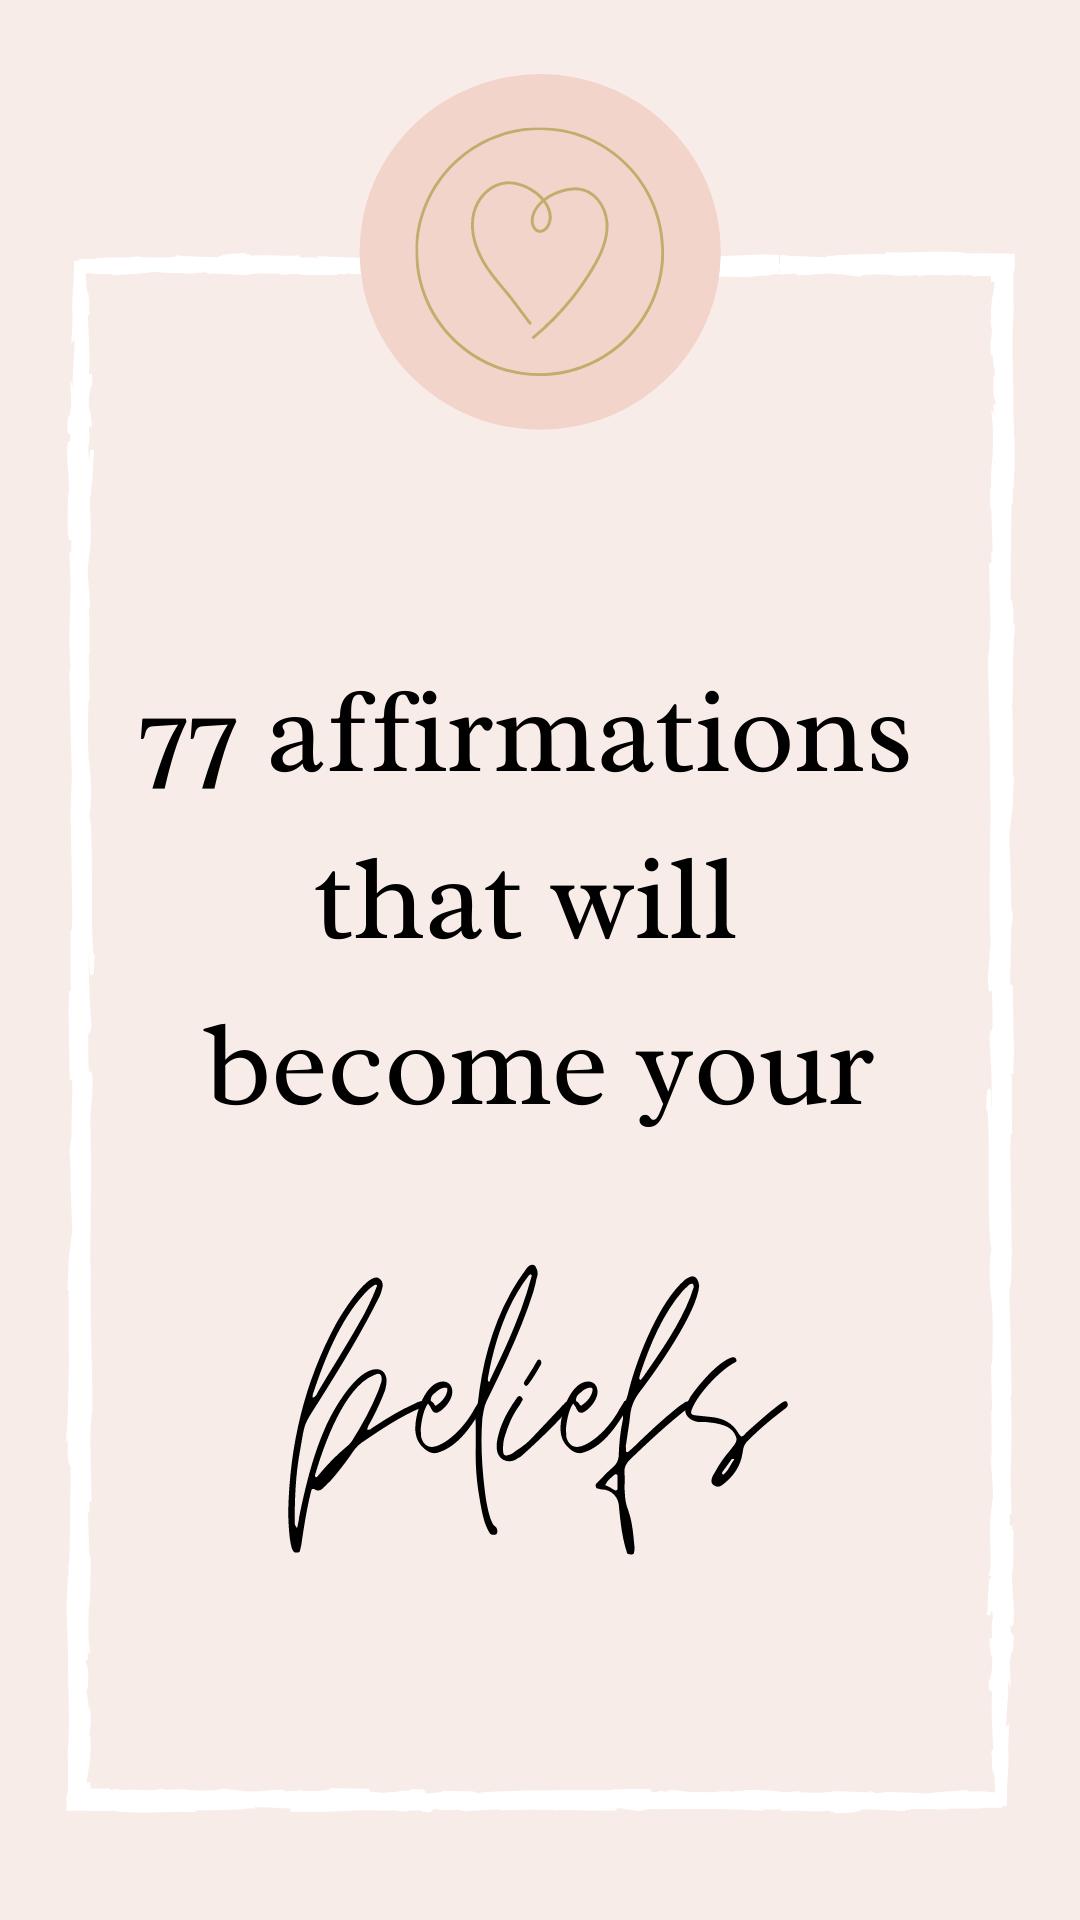 77 affirmations